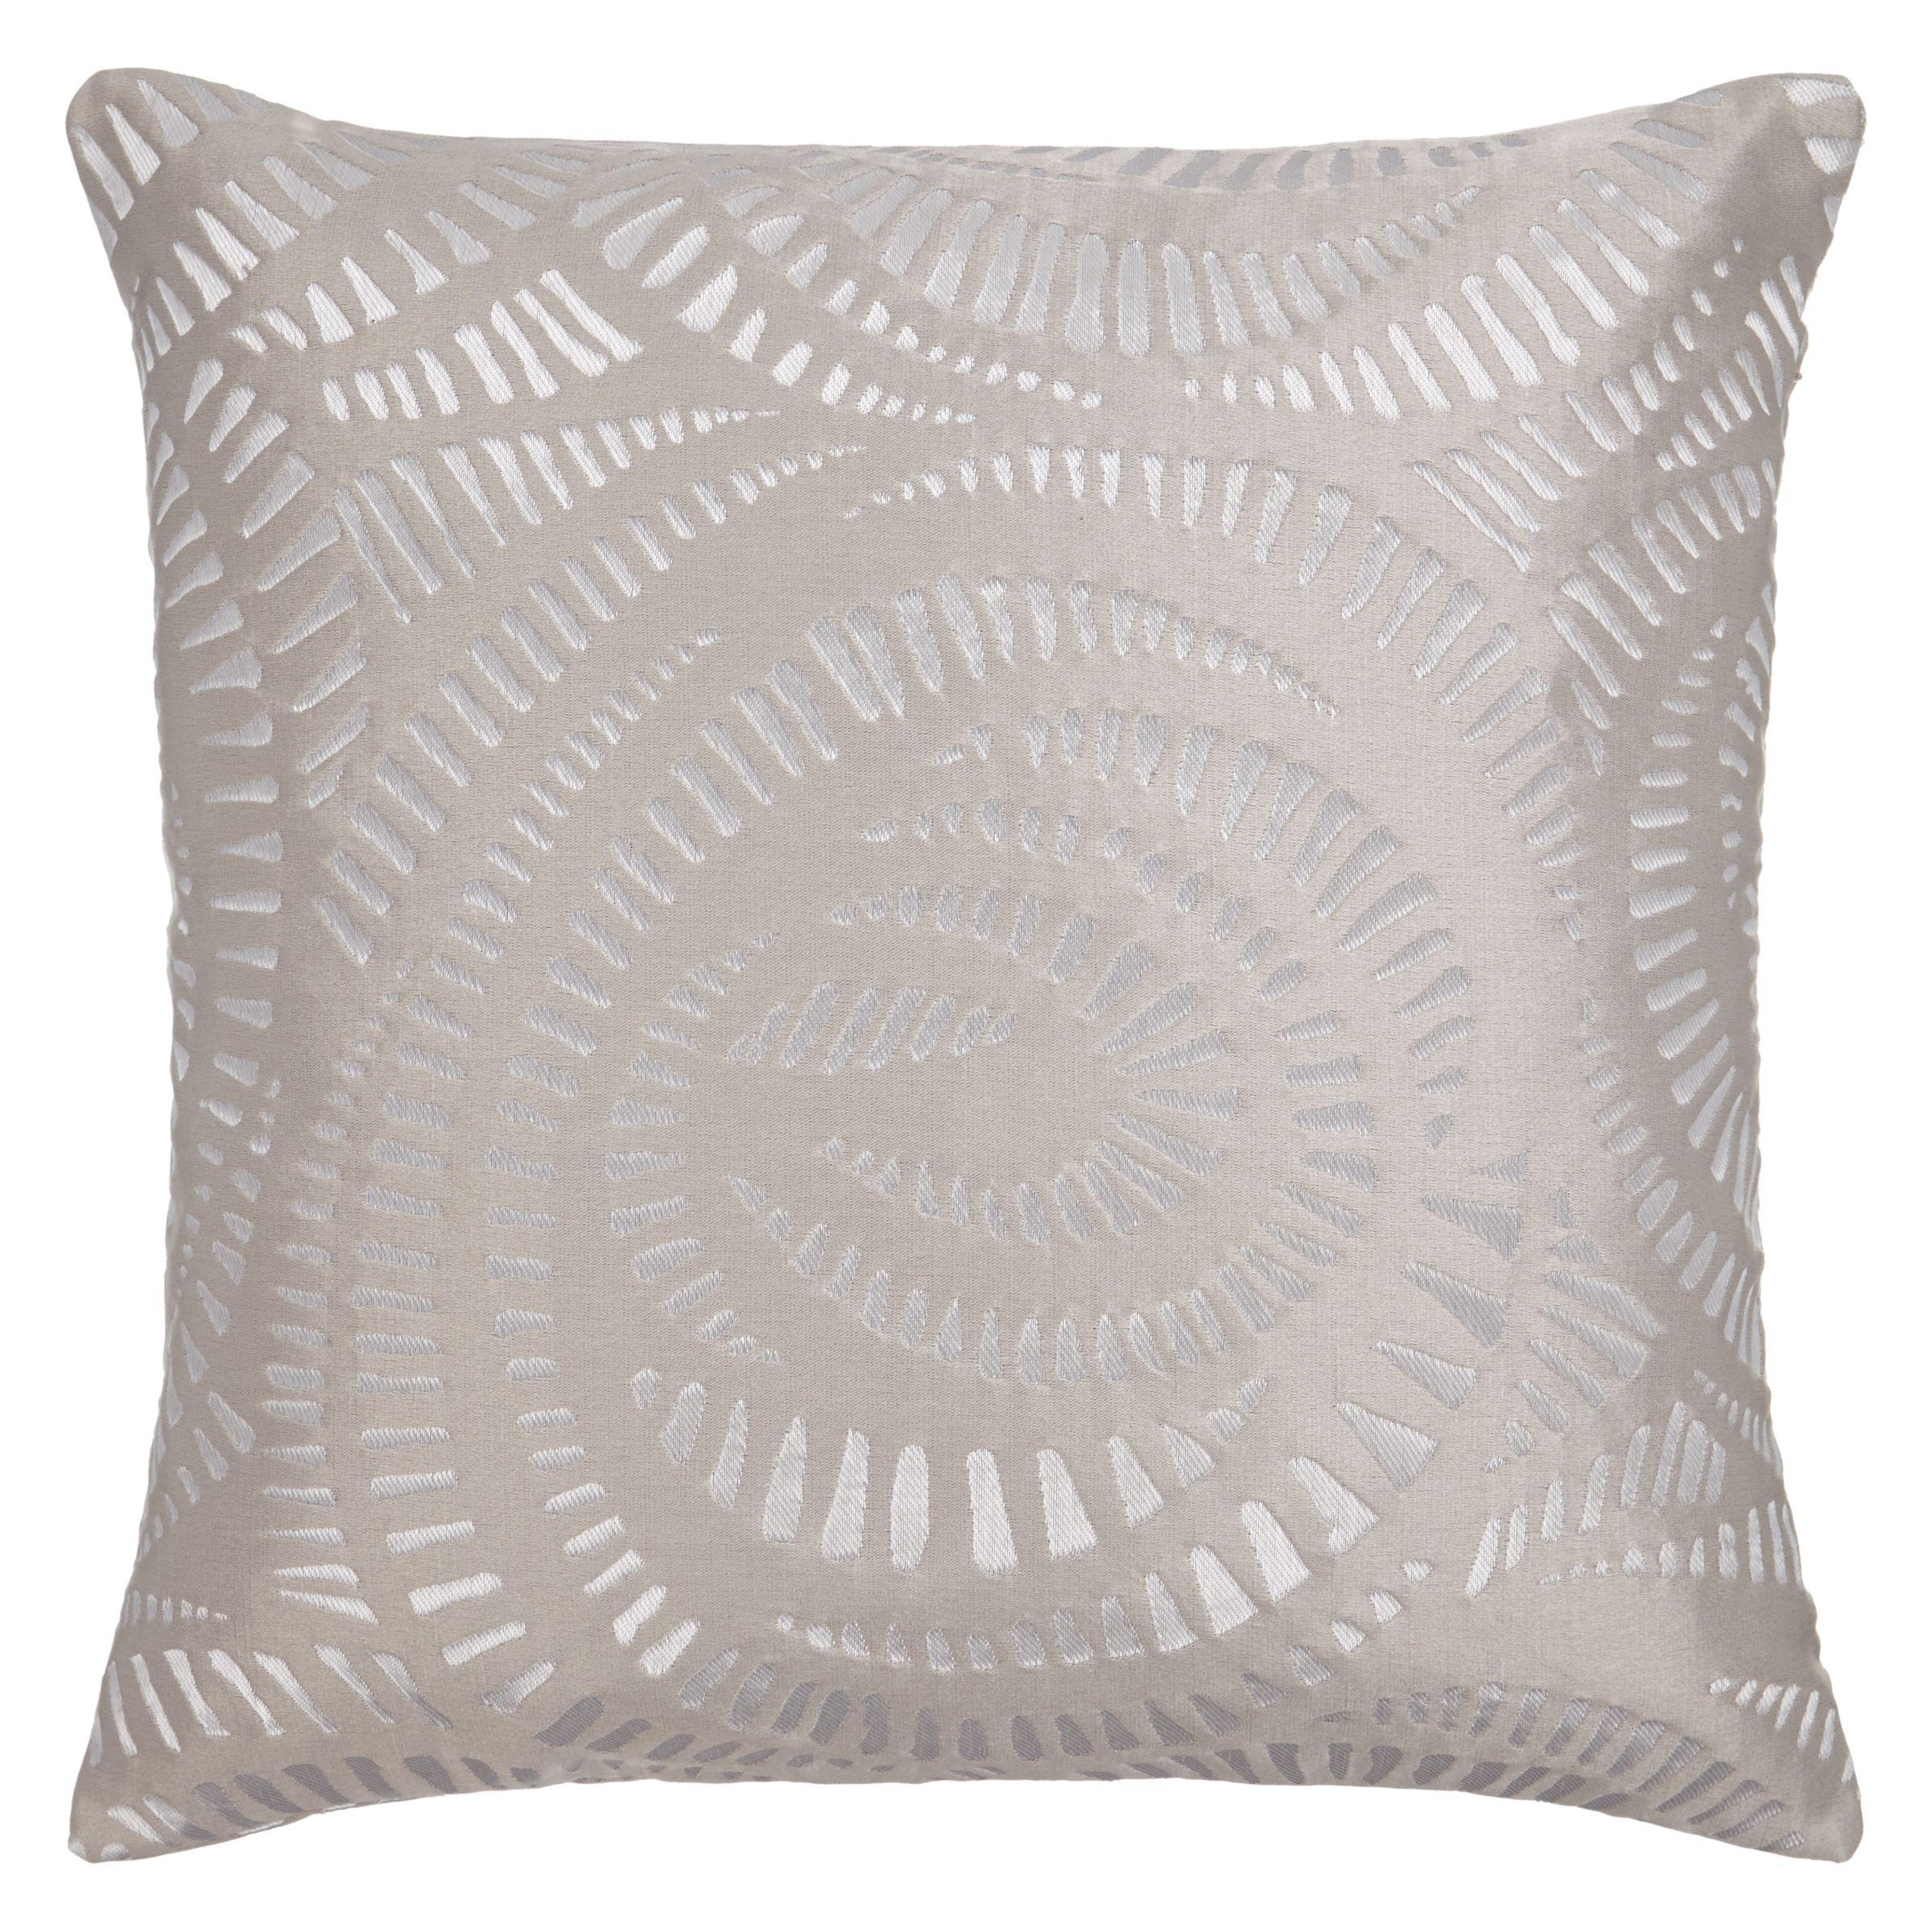 Harlequin Harlequin Fractal Cushion